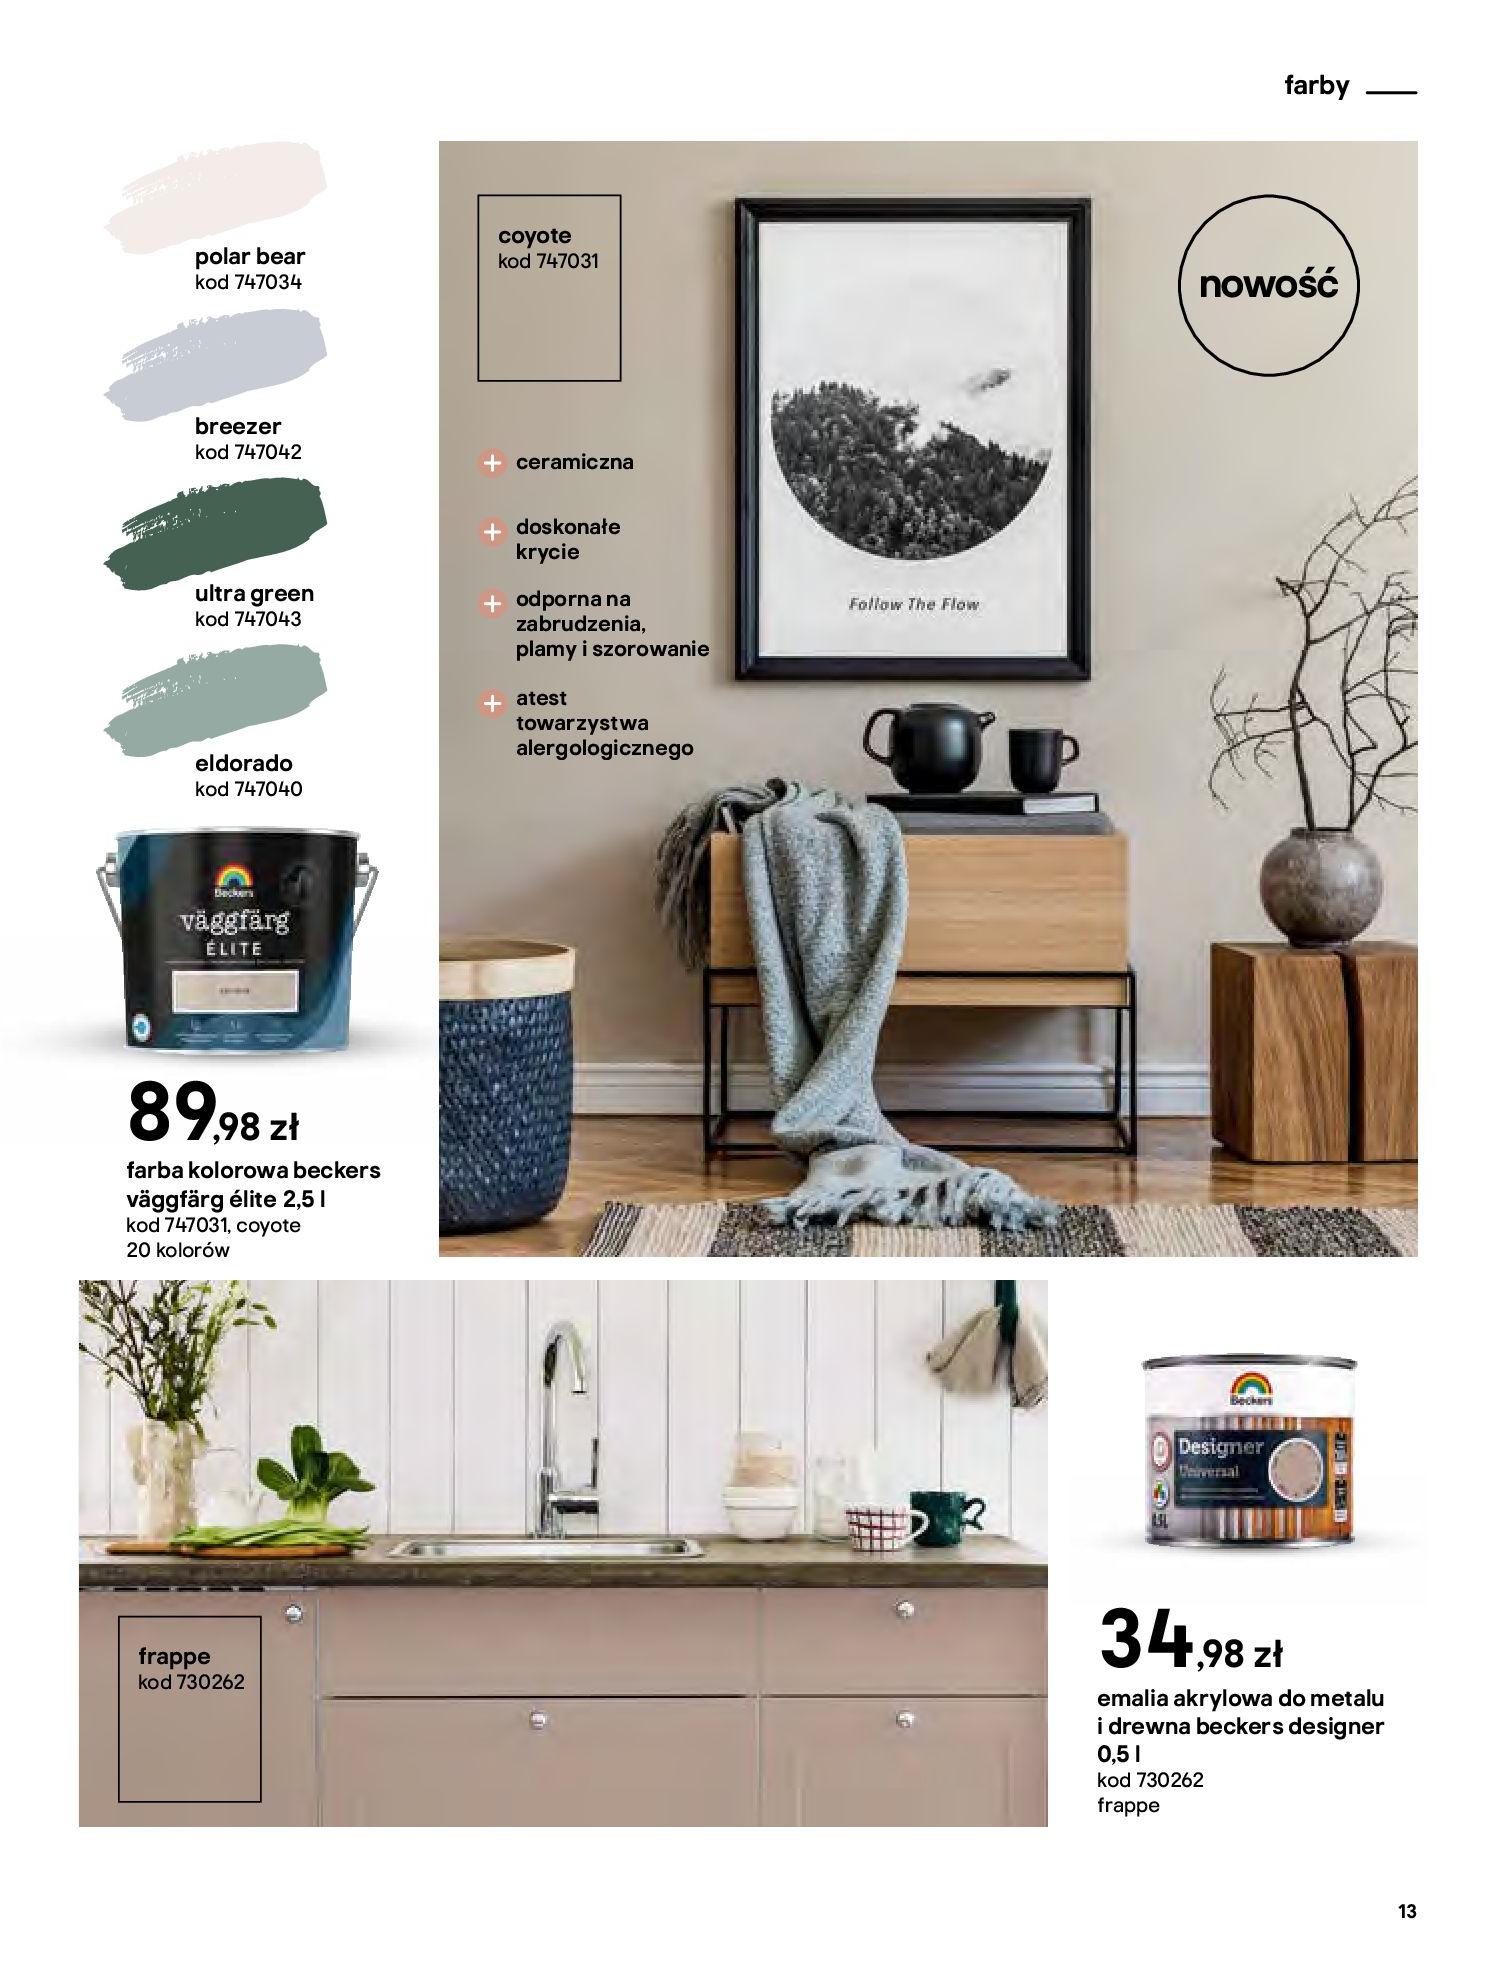 Gazetka Castorama - Katalog Dekoracje-22.10.2020-31.12.2020-page-13